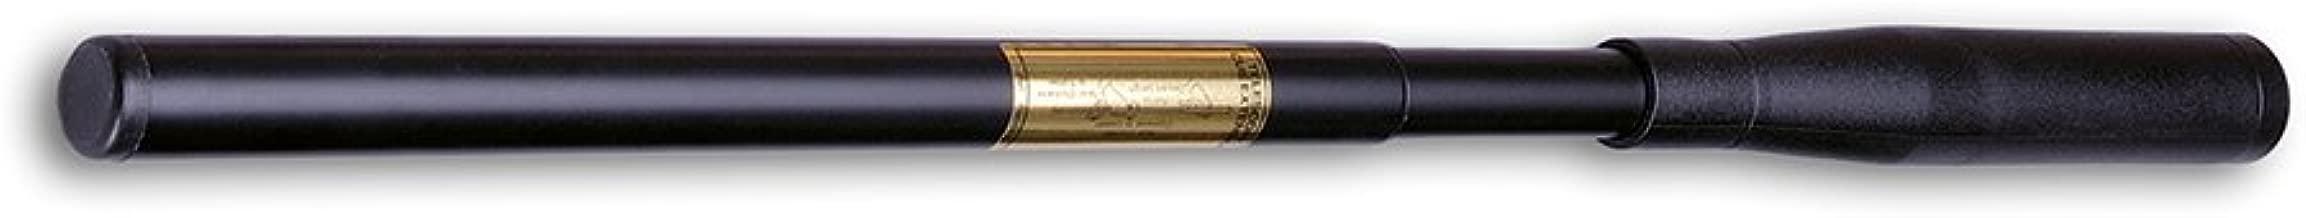 Sharplace 12,6 Teleskop Verl/ängerung f/ür Snooker Queues Queue Teleskop-Verl/ängerung